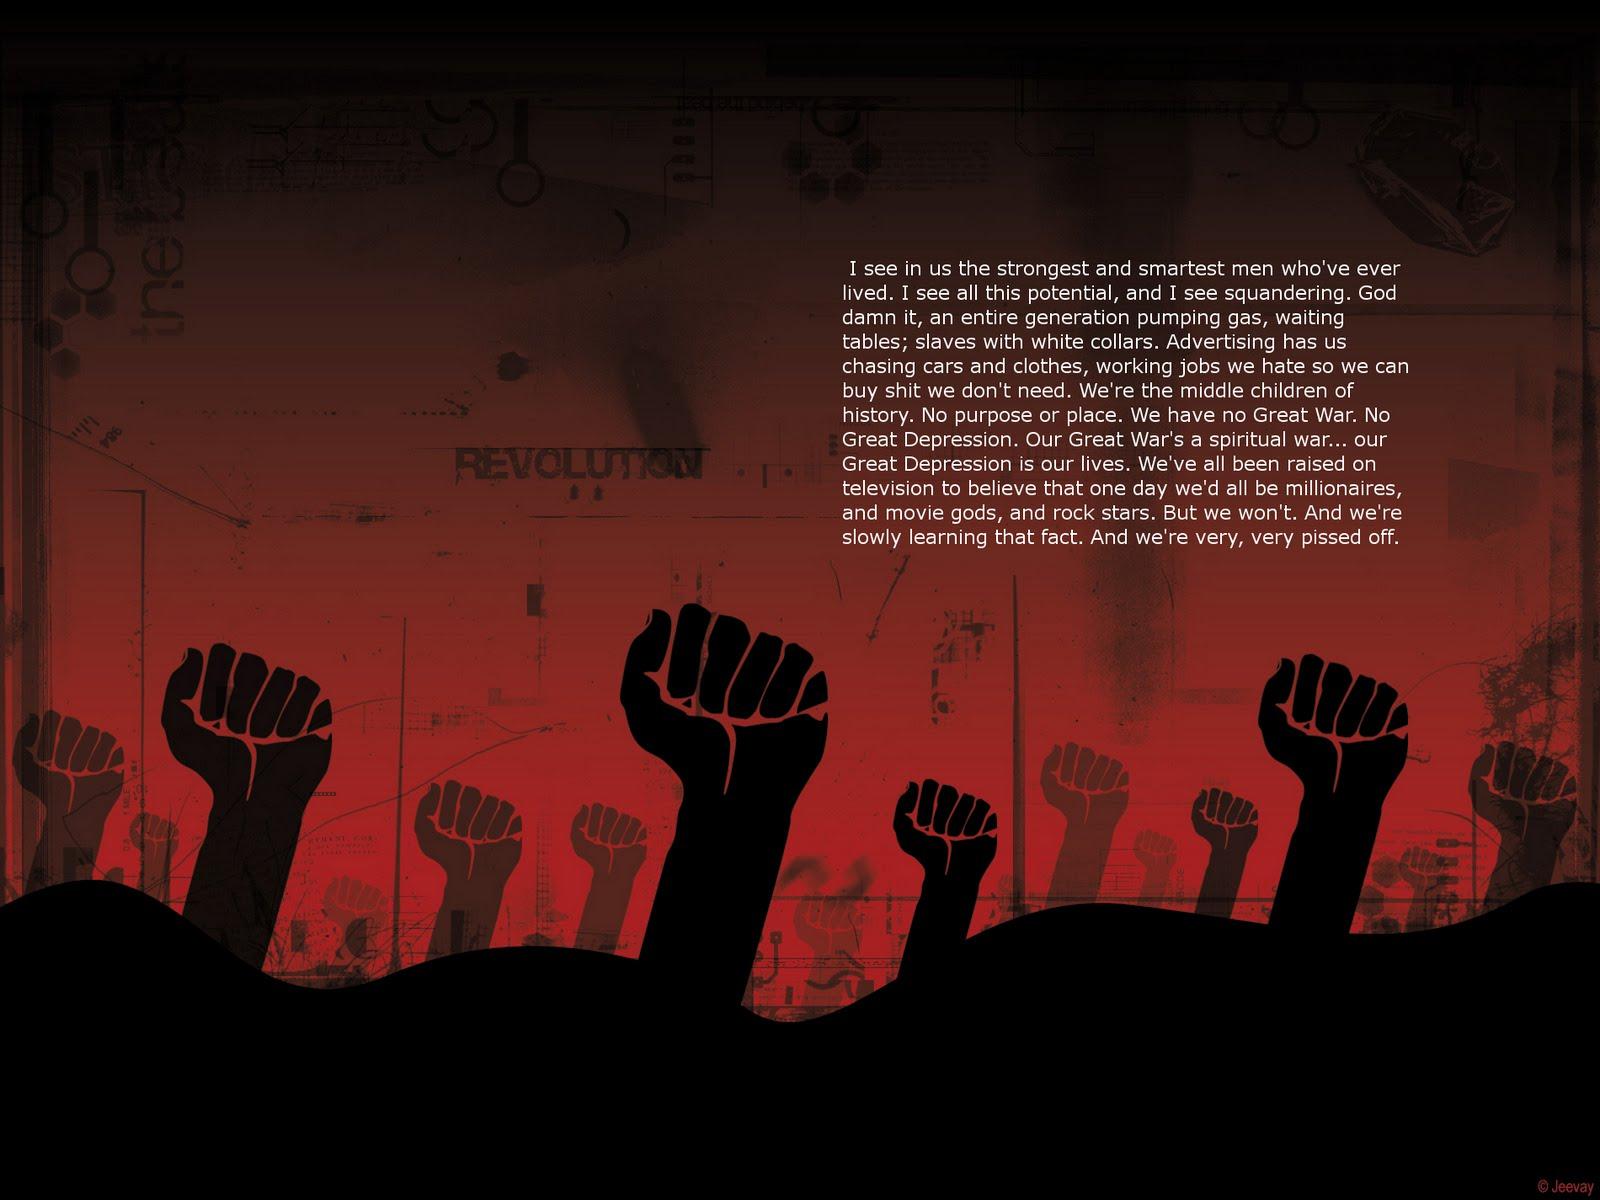 Best 61 Politics Wallpaper on HipWallpaper Politics Wallpaper 1600x1200